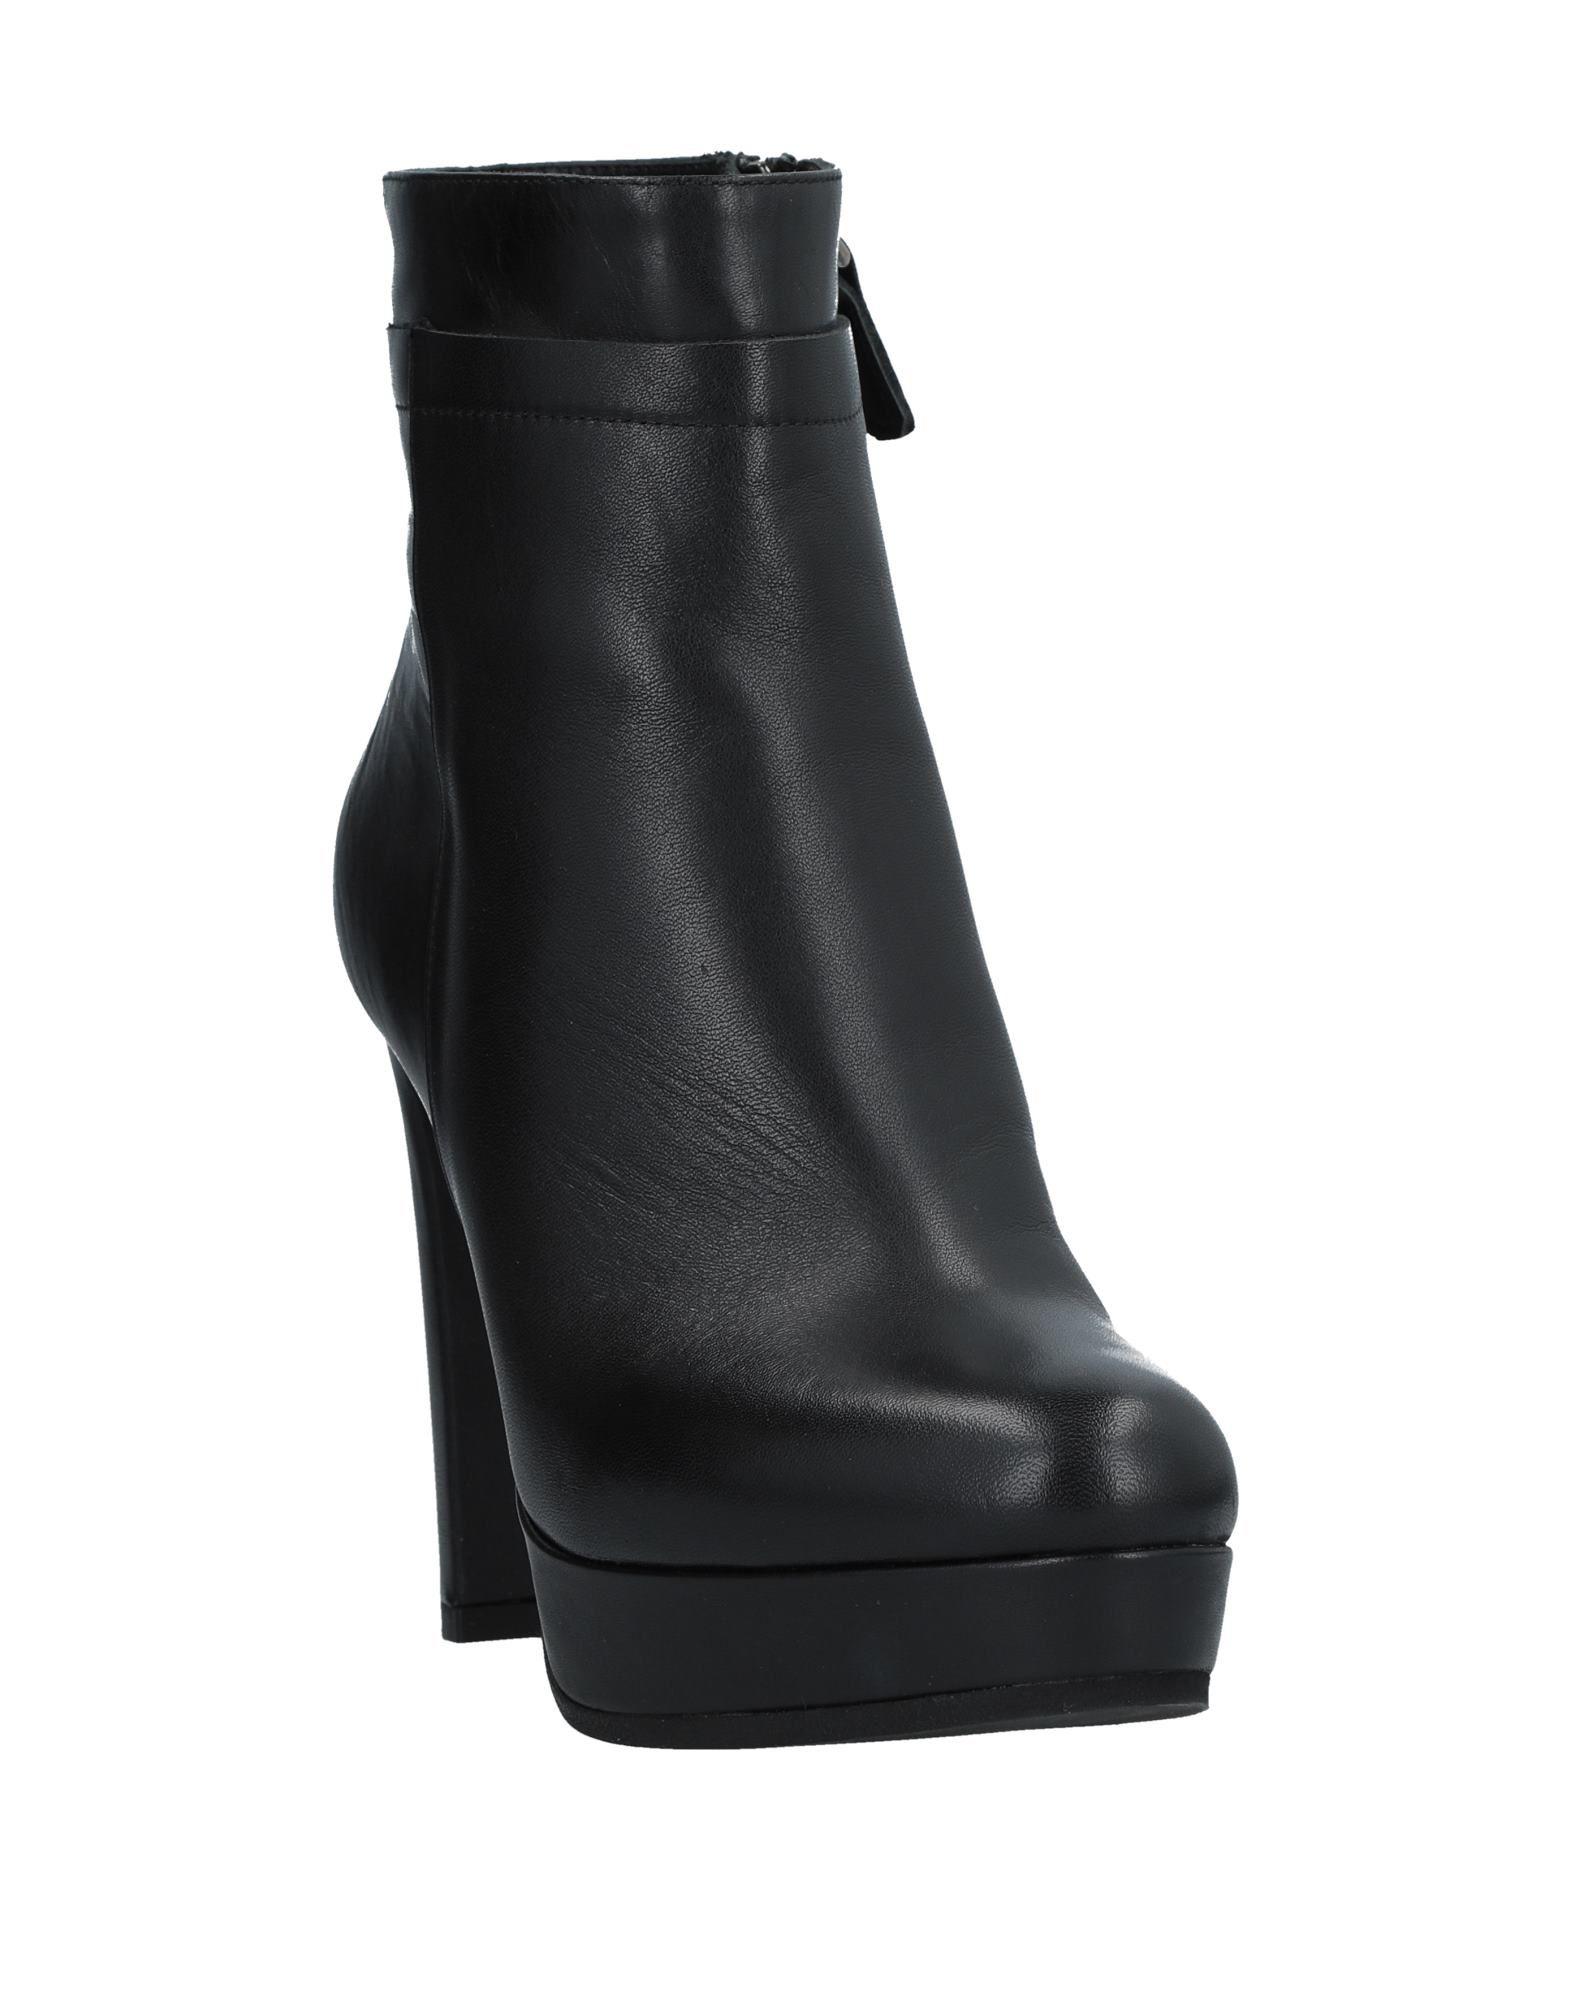 Stilvolle billige Schuhe Damen Chantal Stiefelette Damen Schuhe  11533947KP 519d48